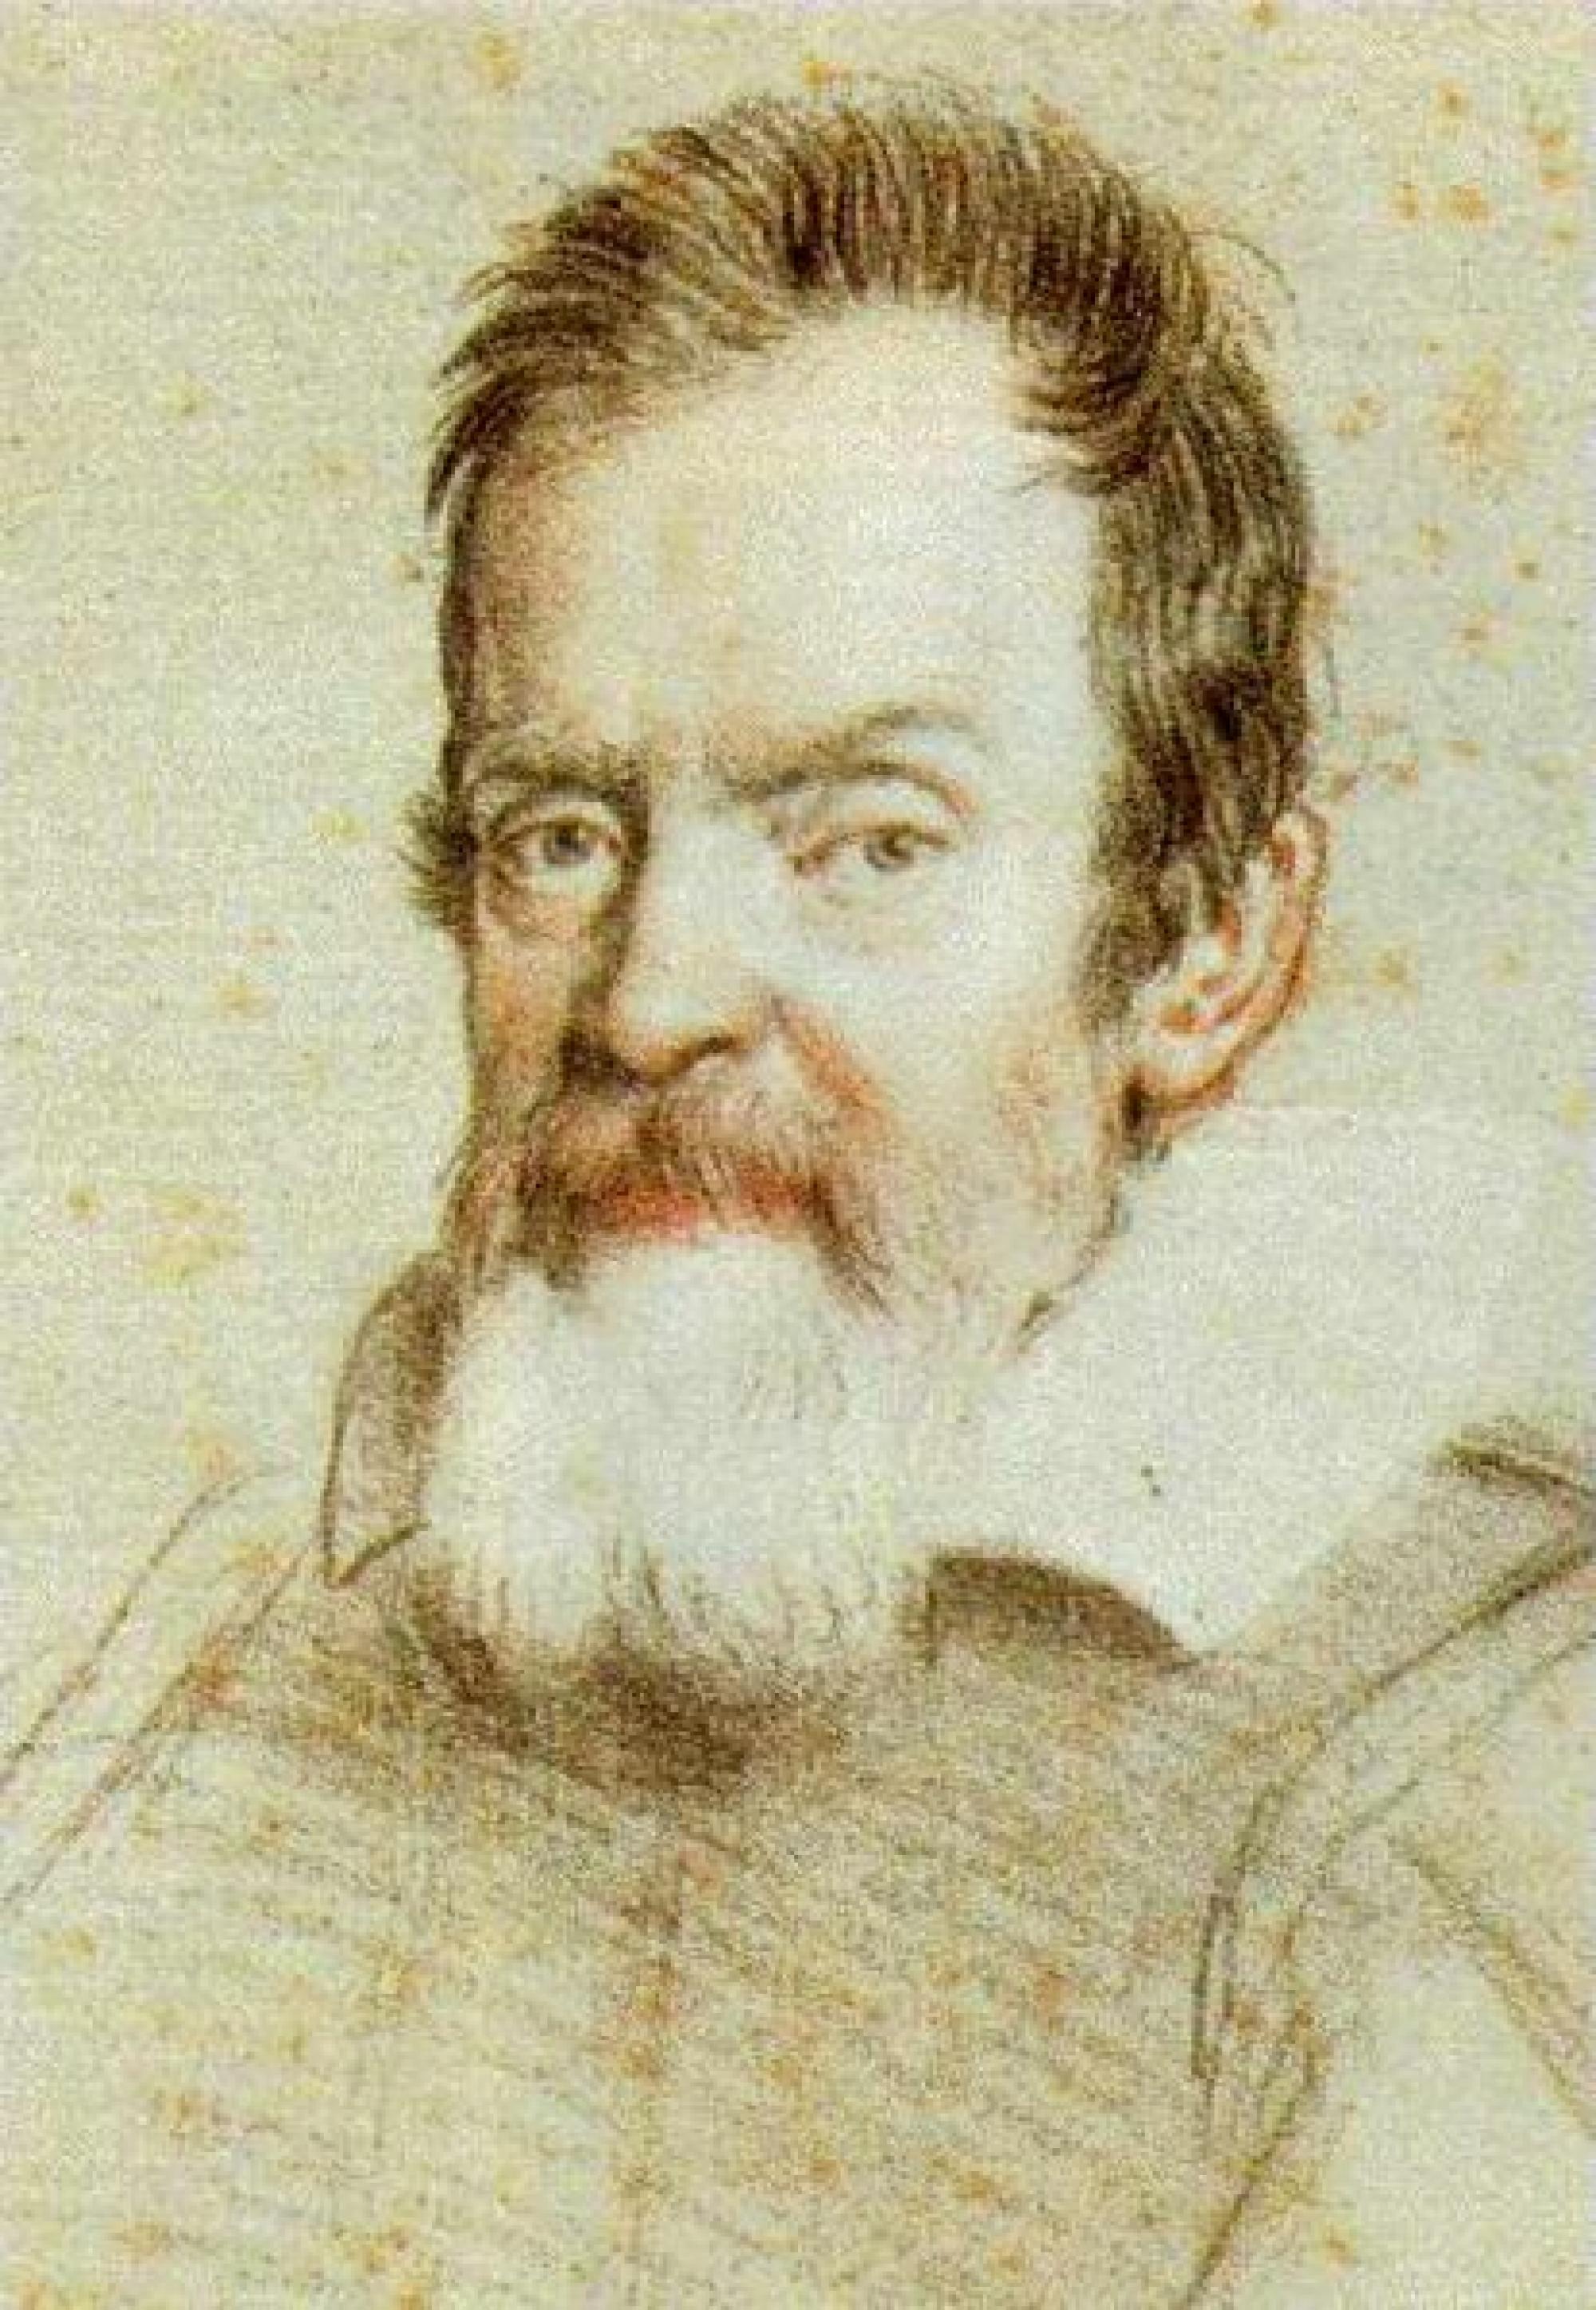 CLICK TO ENLARGE IMAGE. Portrait of Galileo by Italian Baroque era printmaker and painter Ottavio Leoni, 1624.